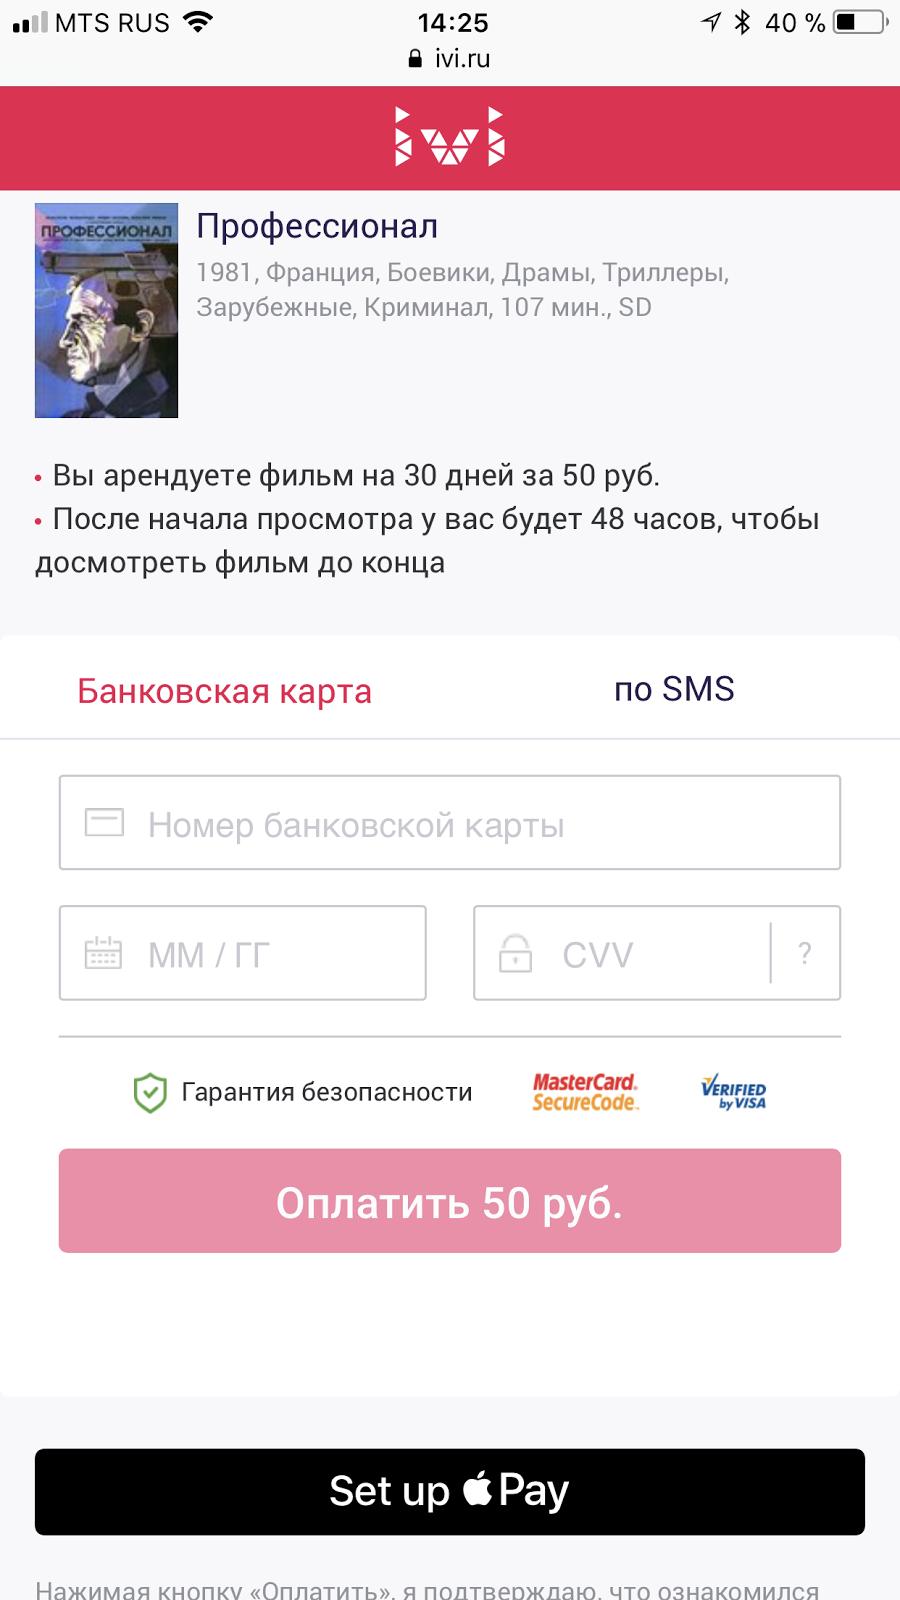 Подключаем оплату через Apple Pay на сайте - 3